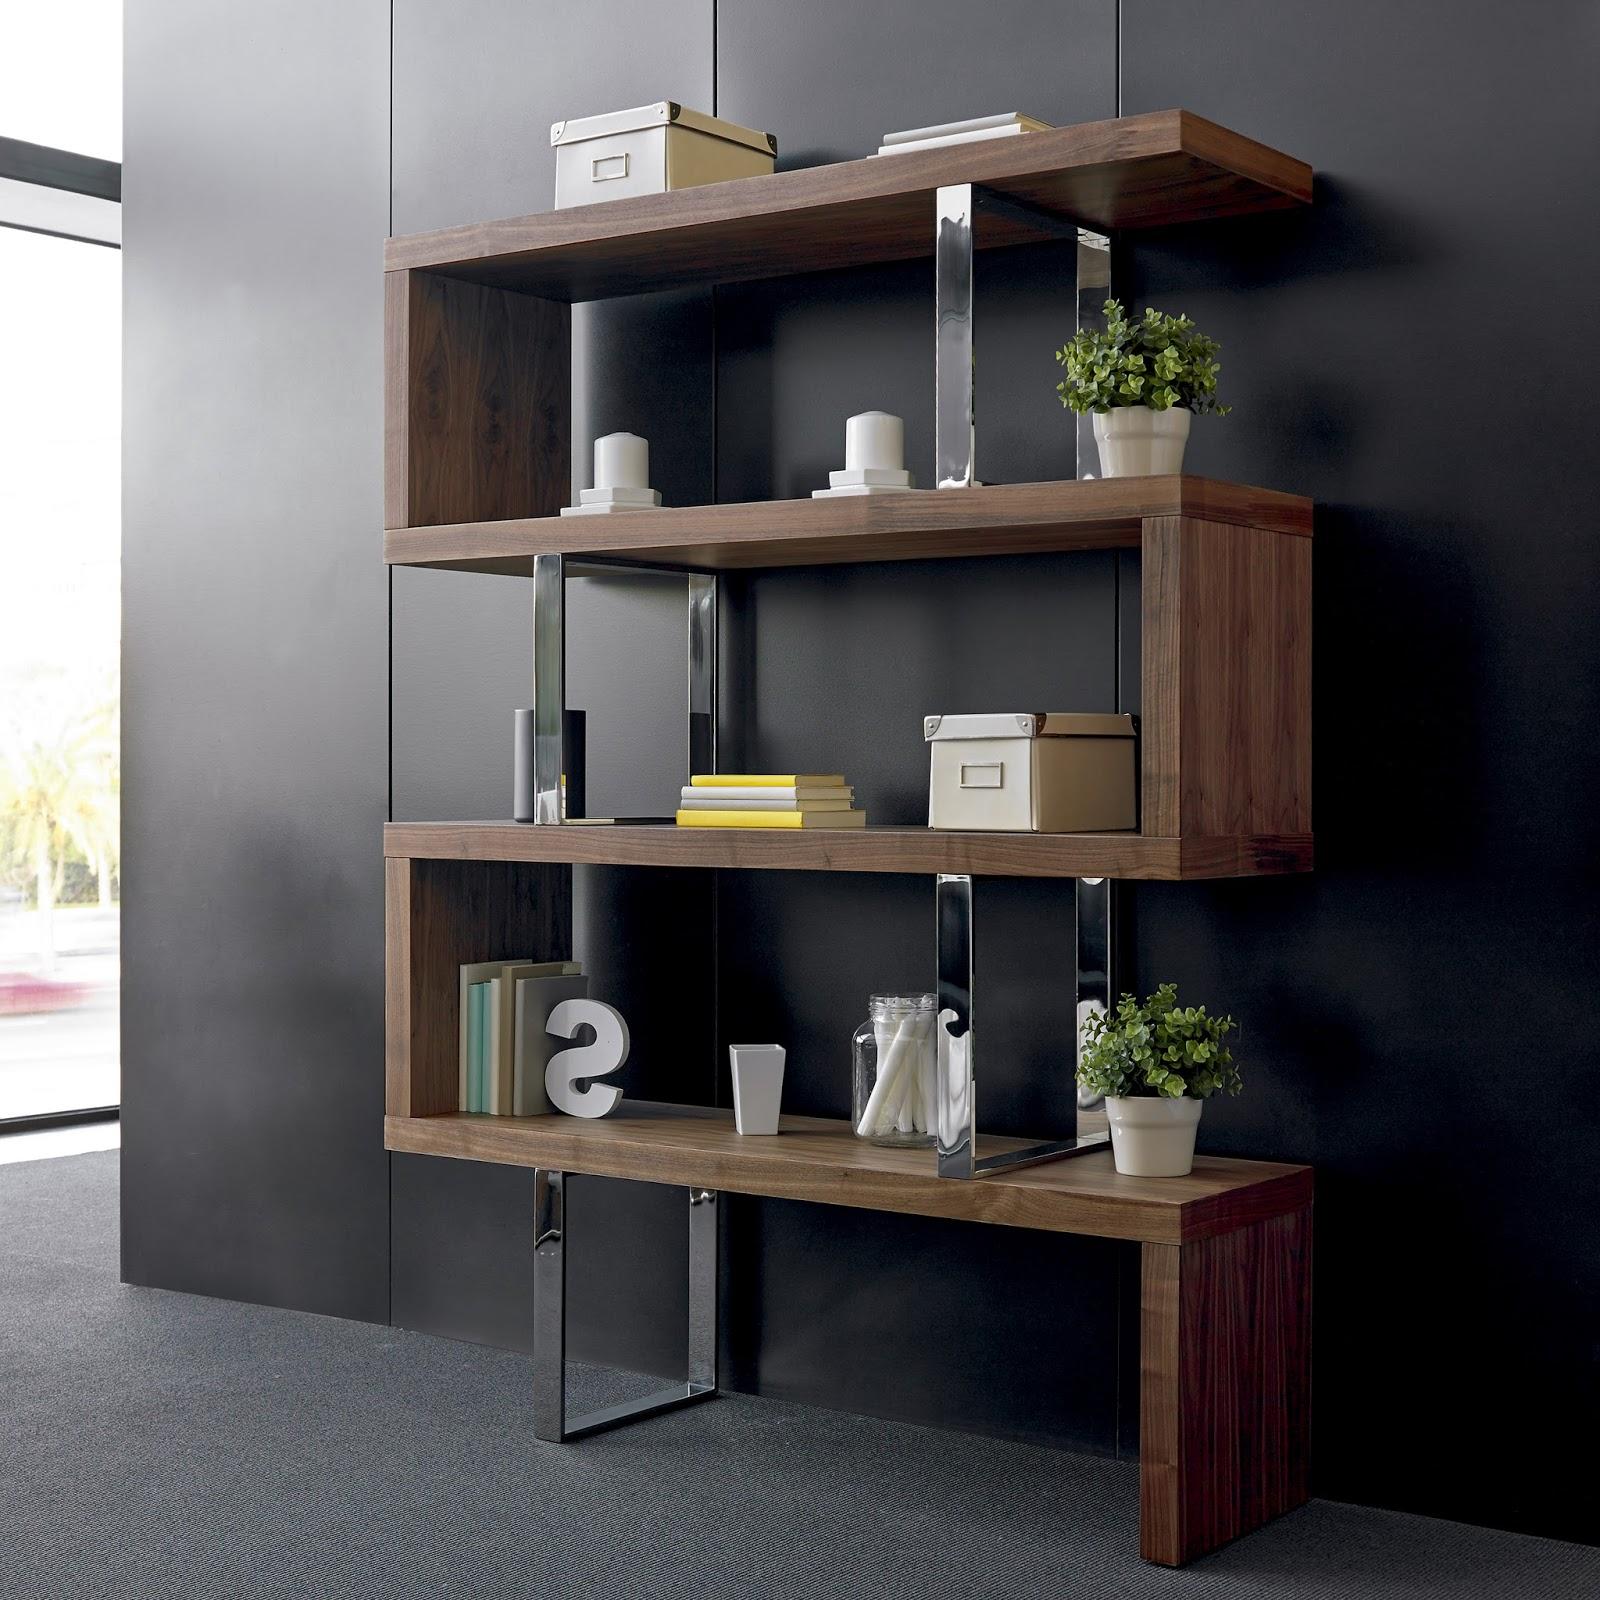 Muebles de sal n librerias para ordenar el salon for Librerias salon modernas